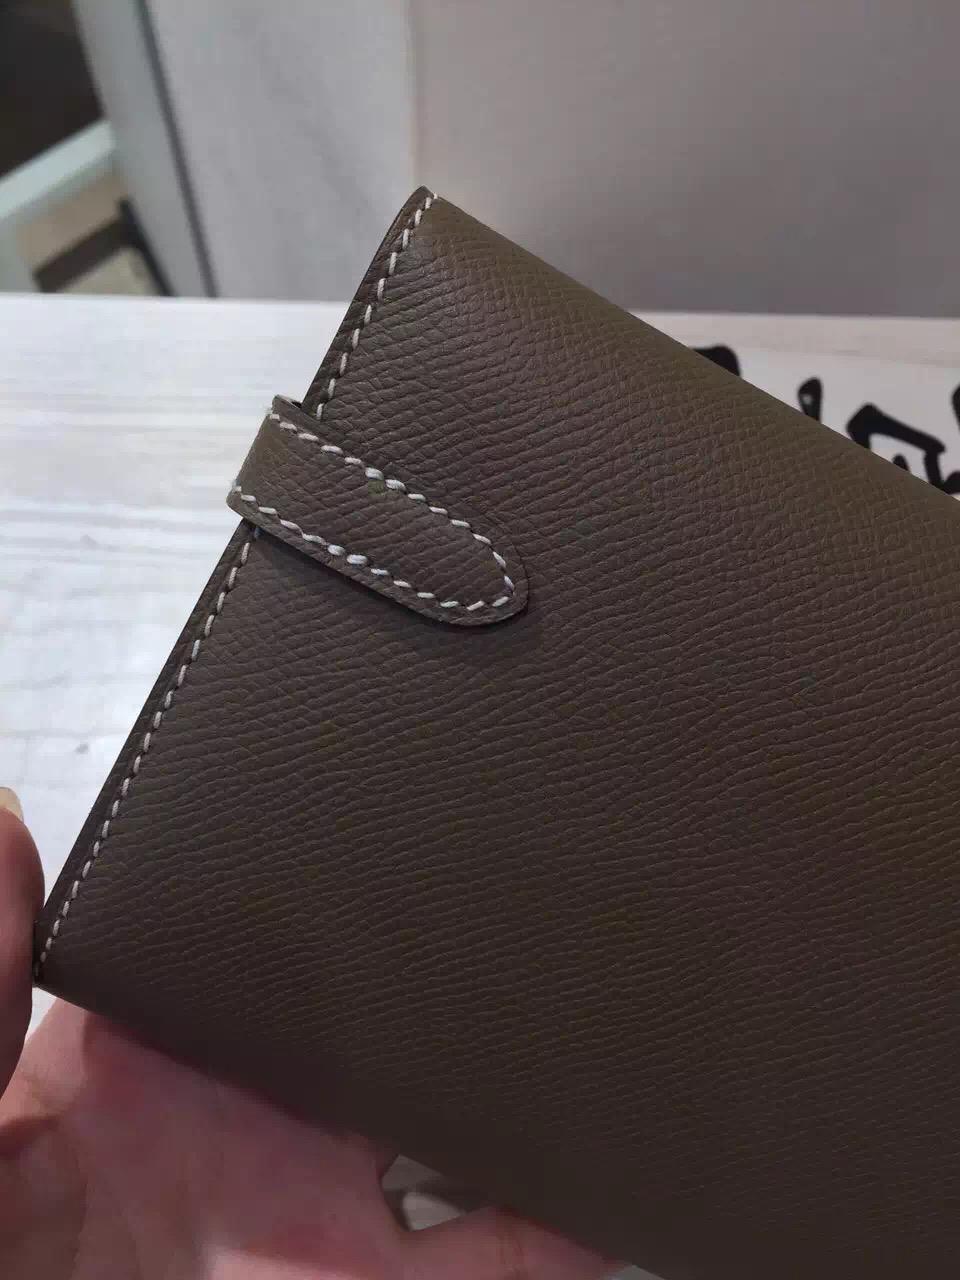 Sale Hermes Kelly Wallet Etoupe Grey Epsom Leather Clutch Bag